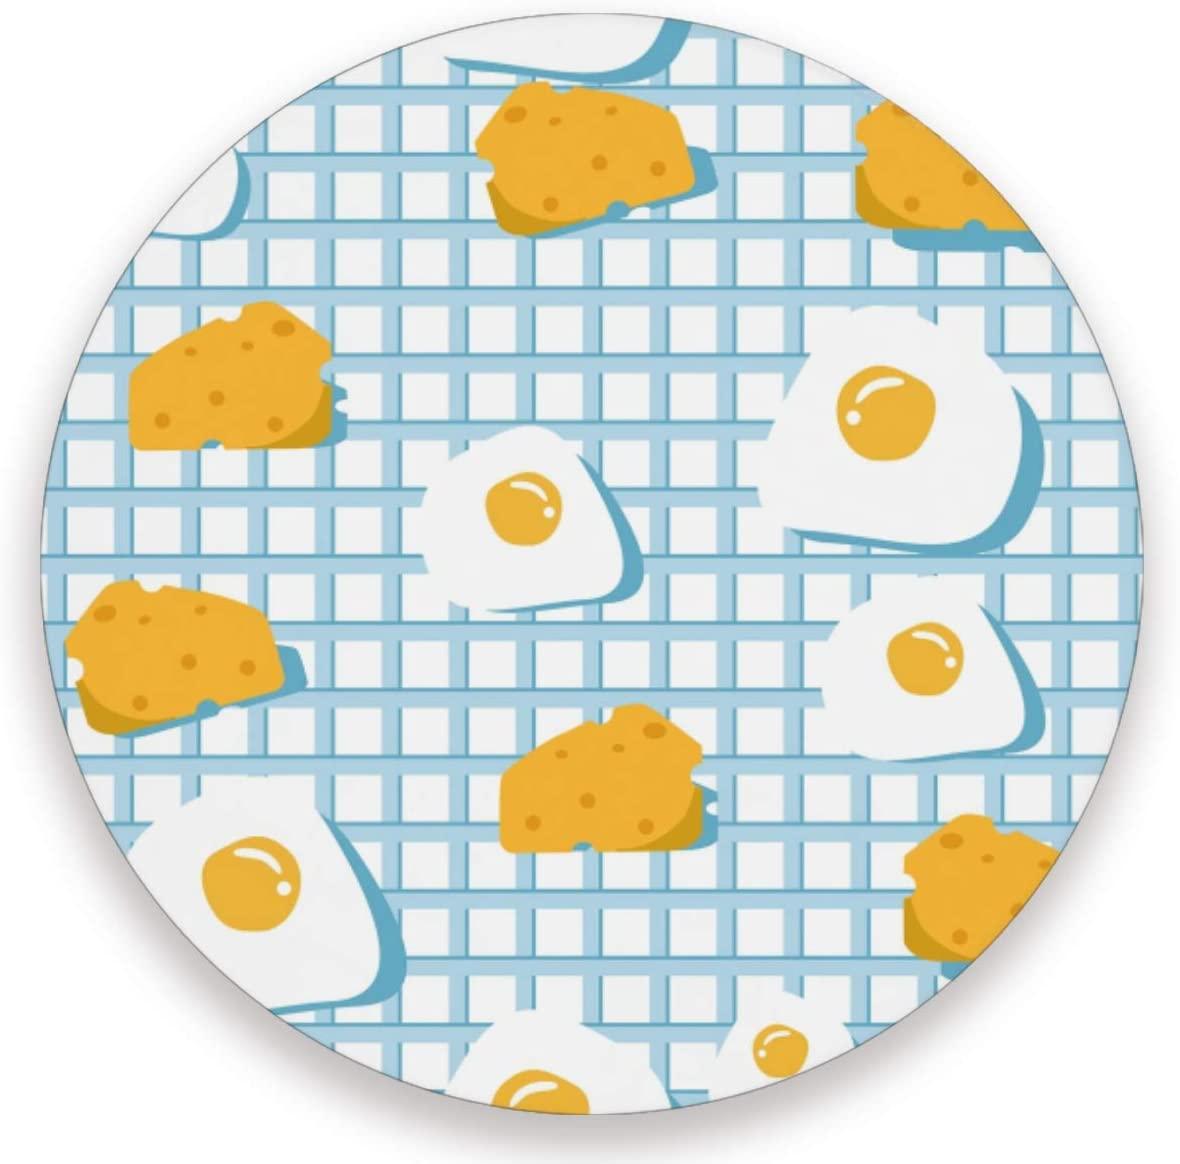 Olinyou Fried Eggs Gudetama Candy Yolk White Blue Plaid Coasters for Drinks Set of 4 Absorbent Ceramic Stone Round Coaster with Cork Base